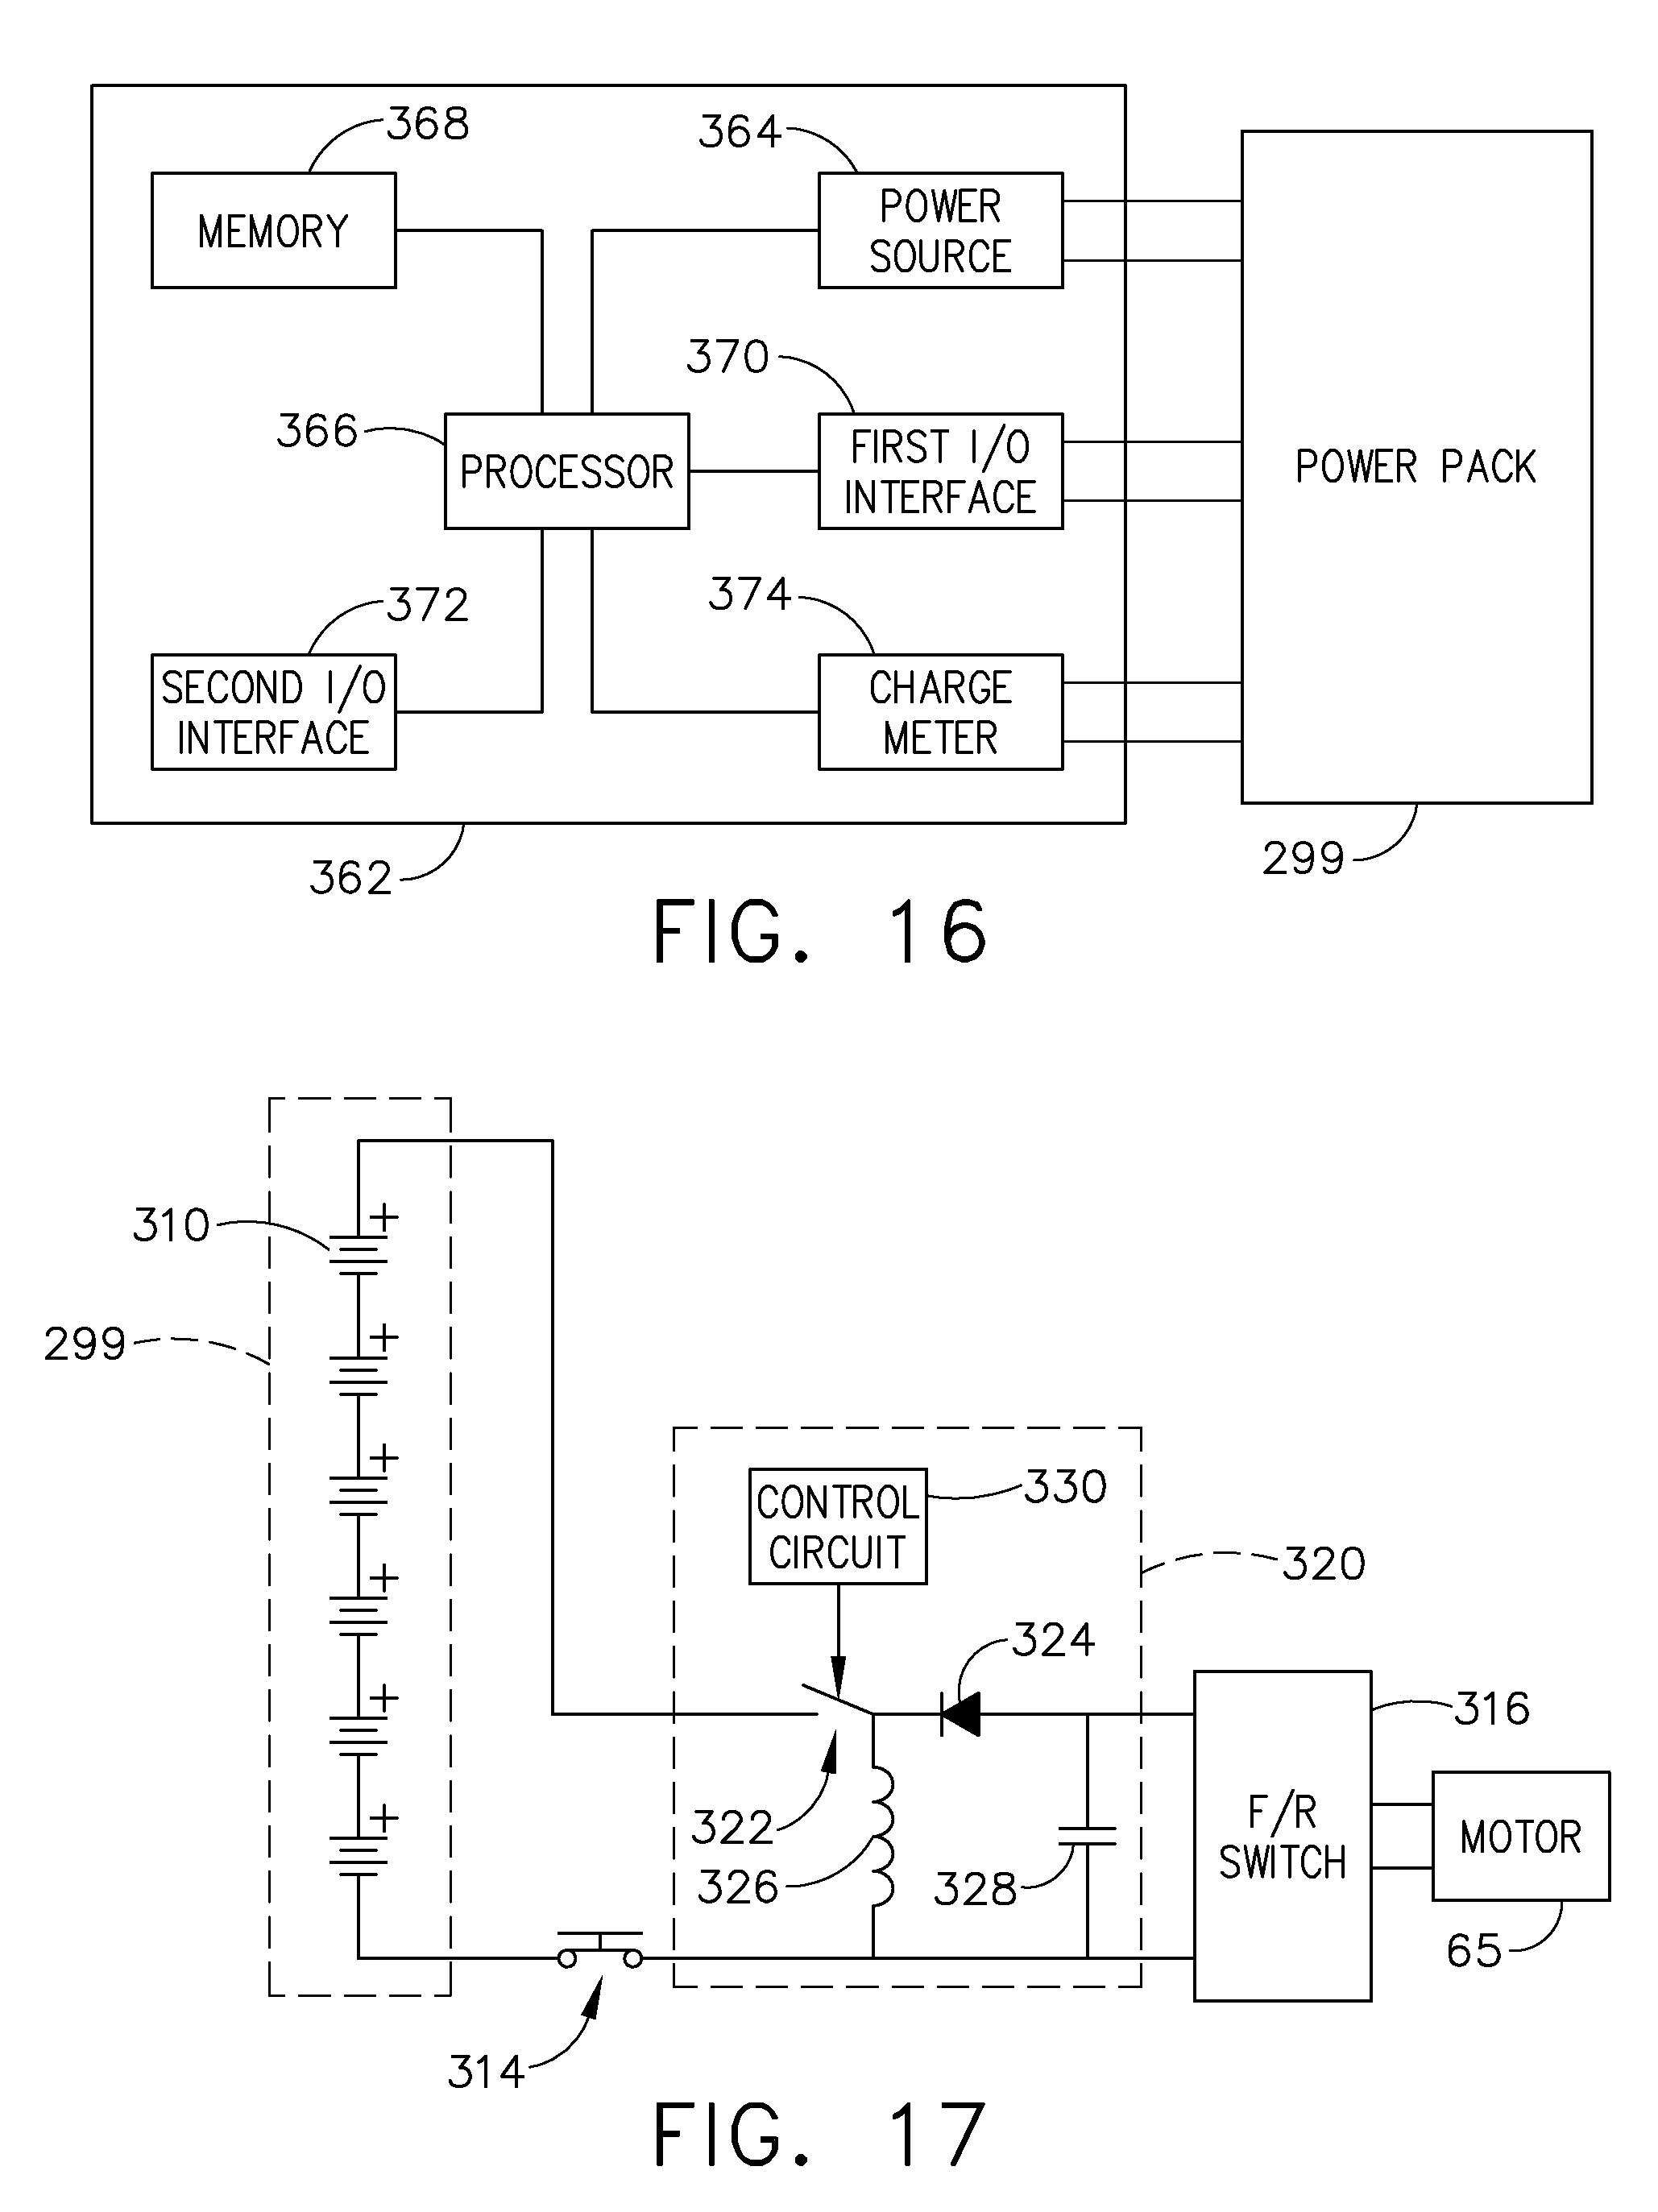 John Deere Wiring Diagram 1982 310a 300b Backhoe 310 Patent Us 9179912 B2 On 310c